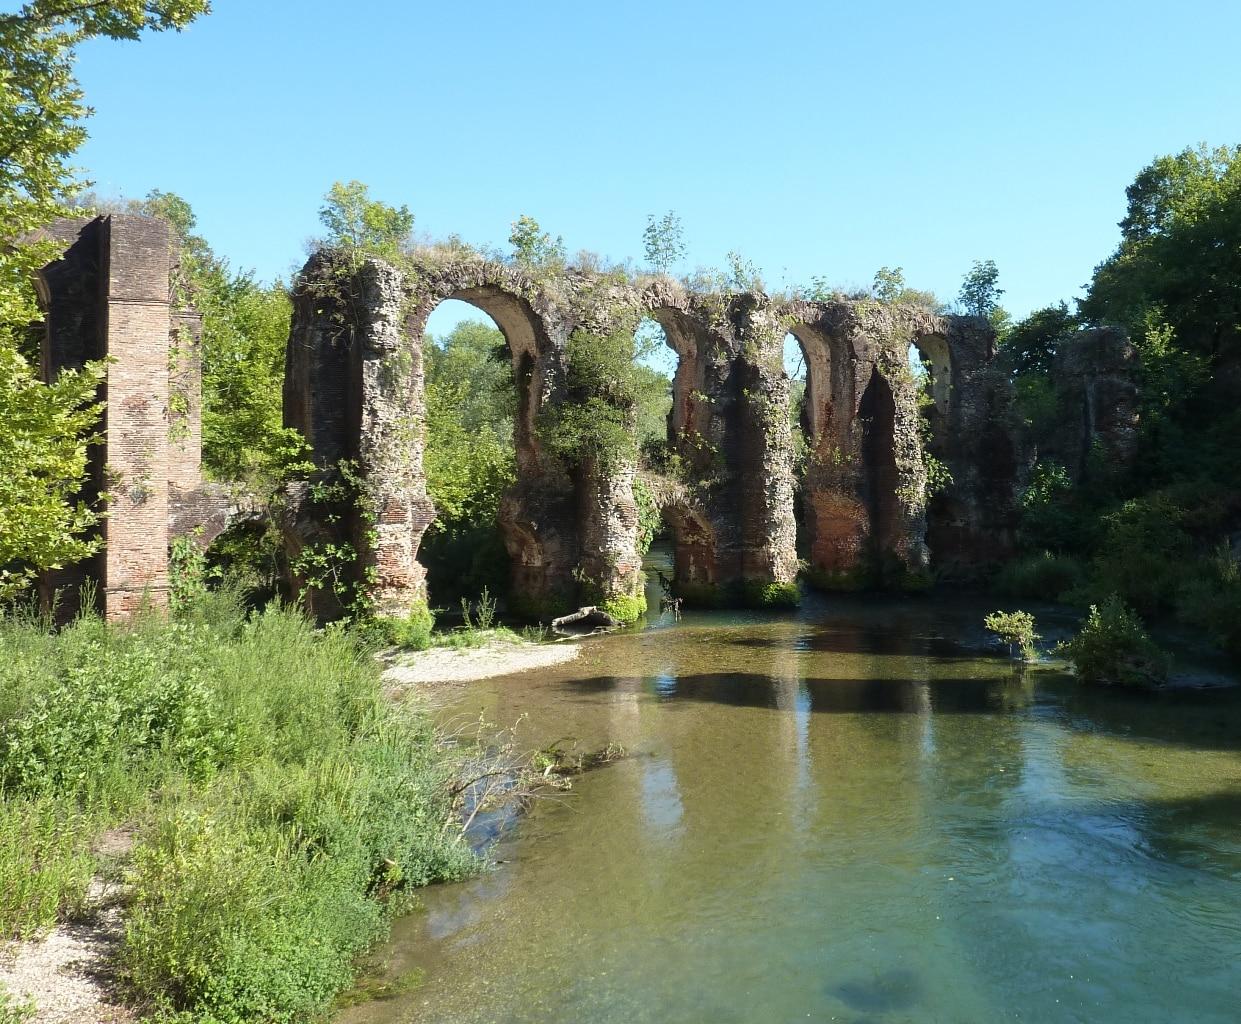 The Roman Aqueduct